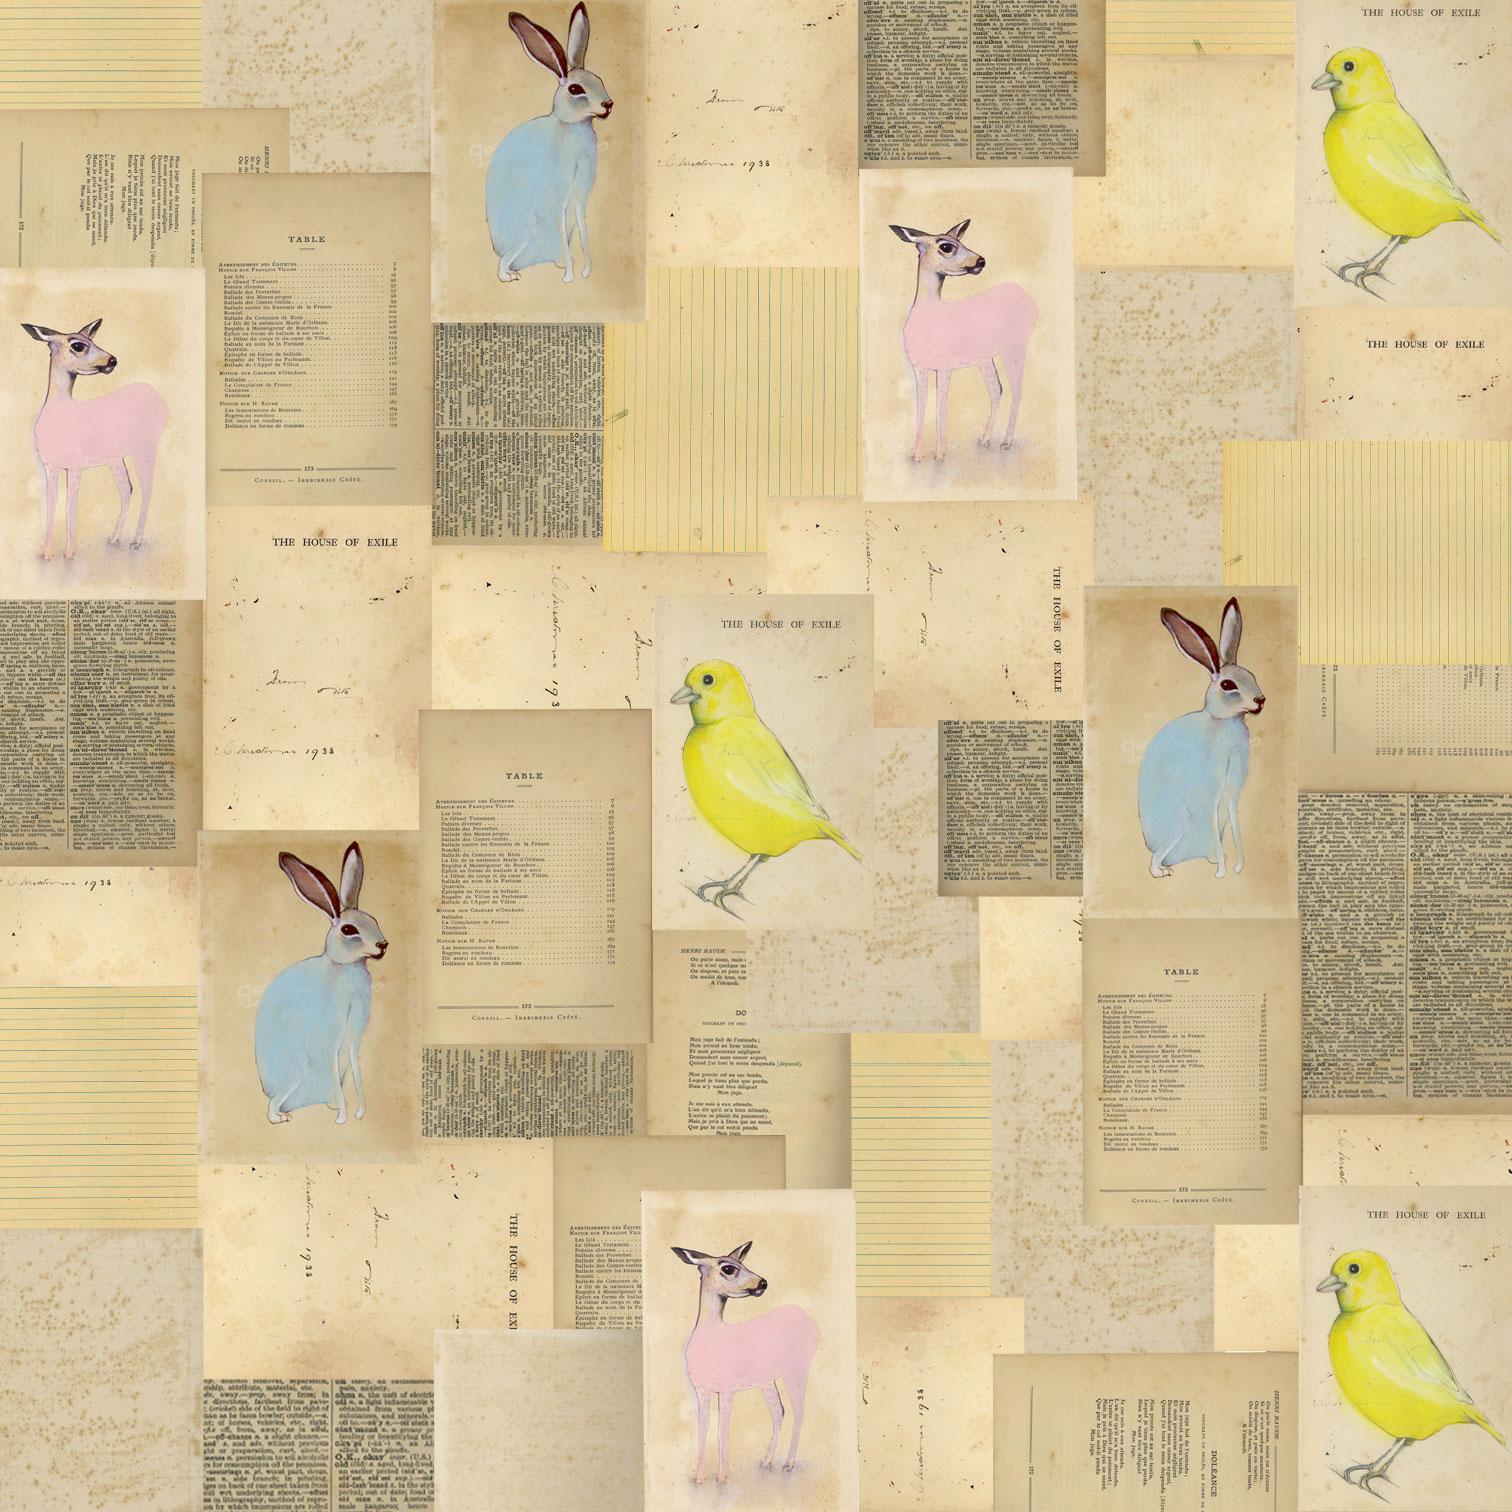 http://2.bp.blogspot.com/-wG7TSWdMdXk/Tozjdm6Kn2I/AAAAAAAAAYQ/p5rfxB8FIkE/s1600/animal-wallpaper.jpg